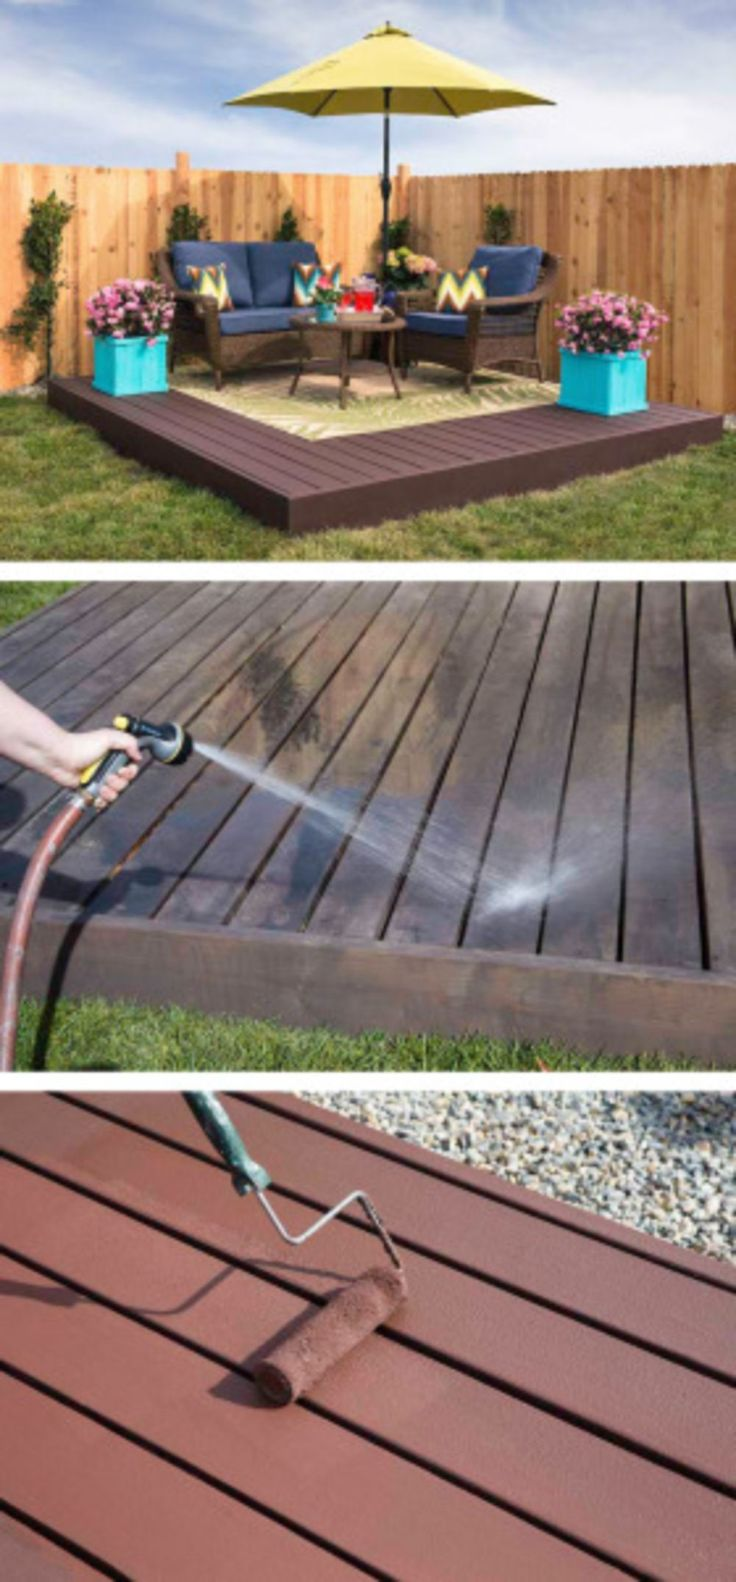 30 diy patio ideas on a budget - Easy Patio Ideas On A Budget